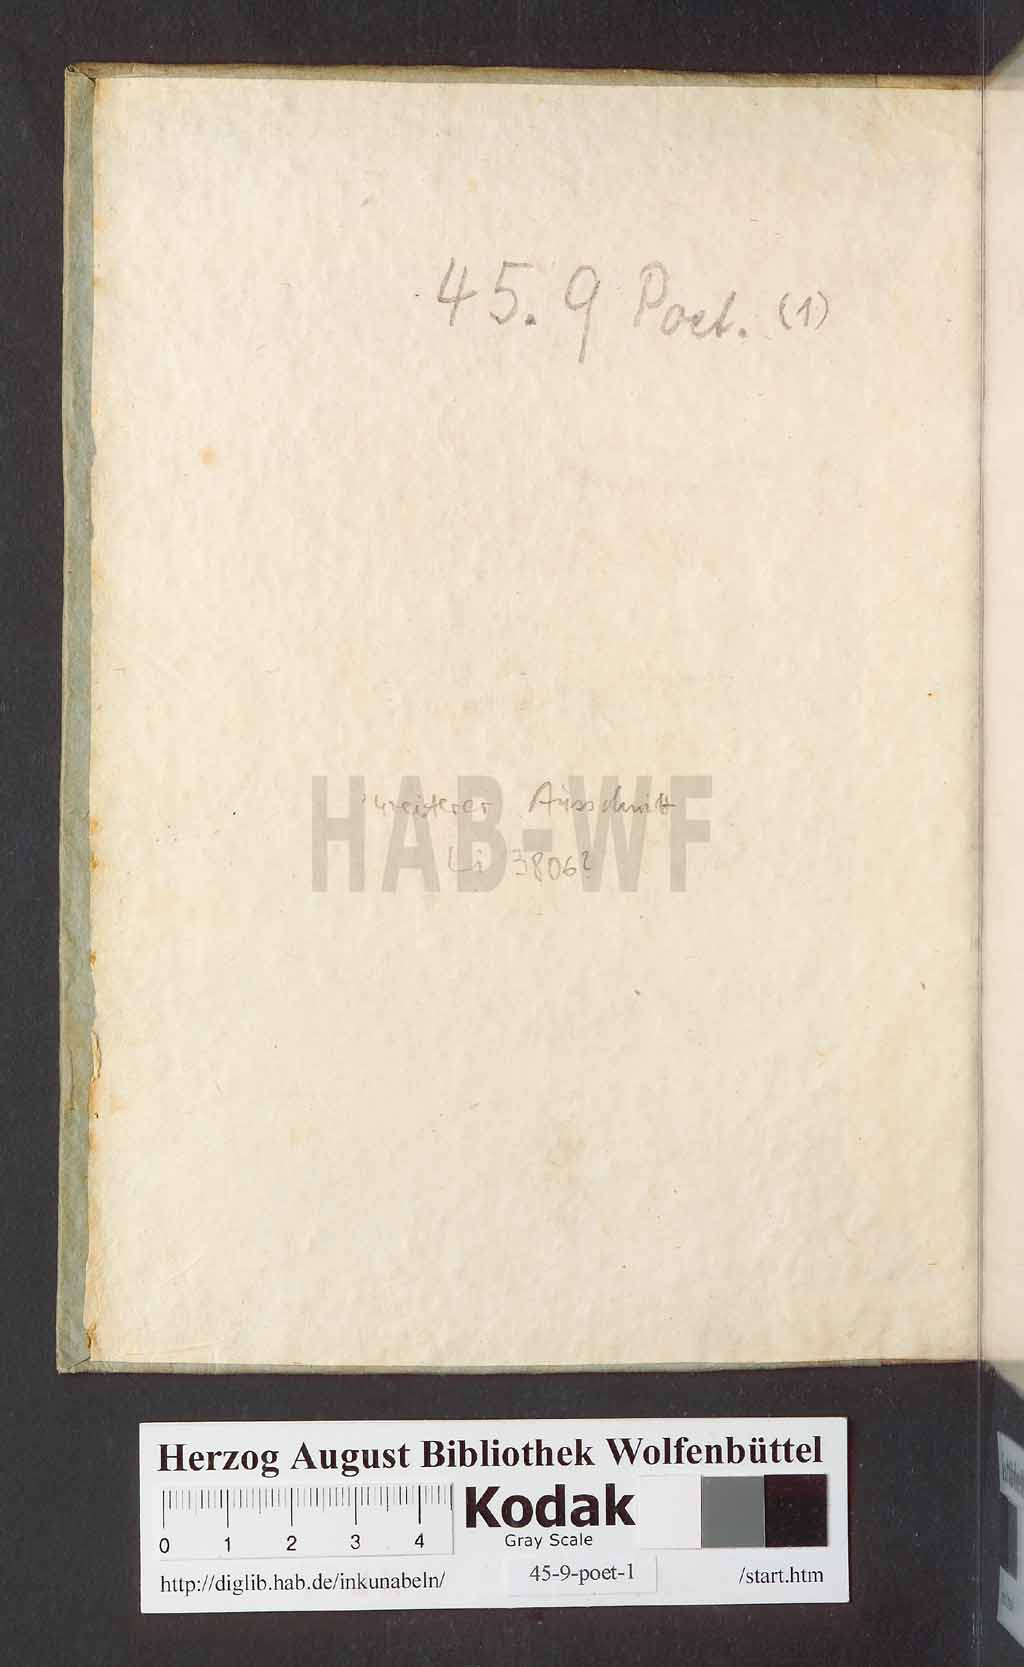 https://diglib.hab.de/inkunabeln/45-9-poet-1/00002.jpg